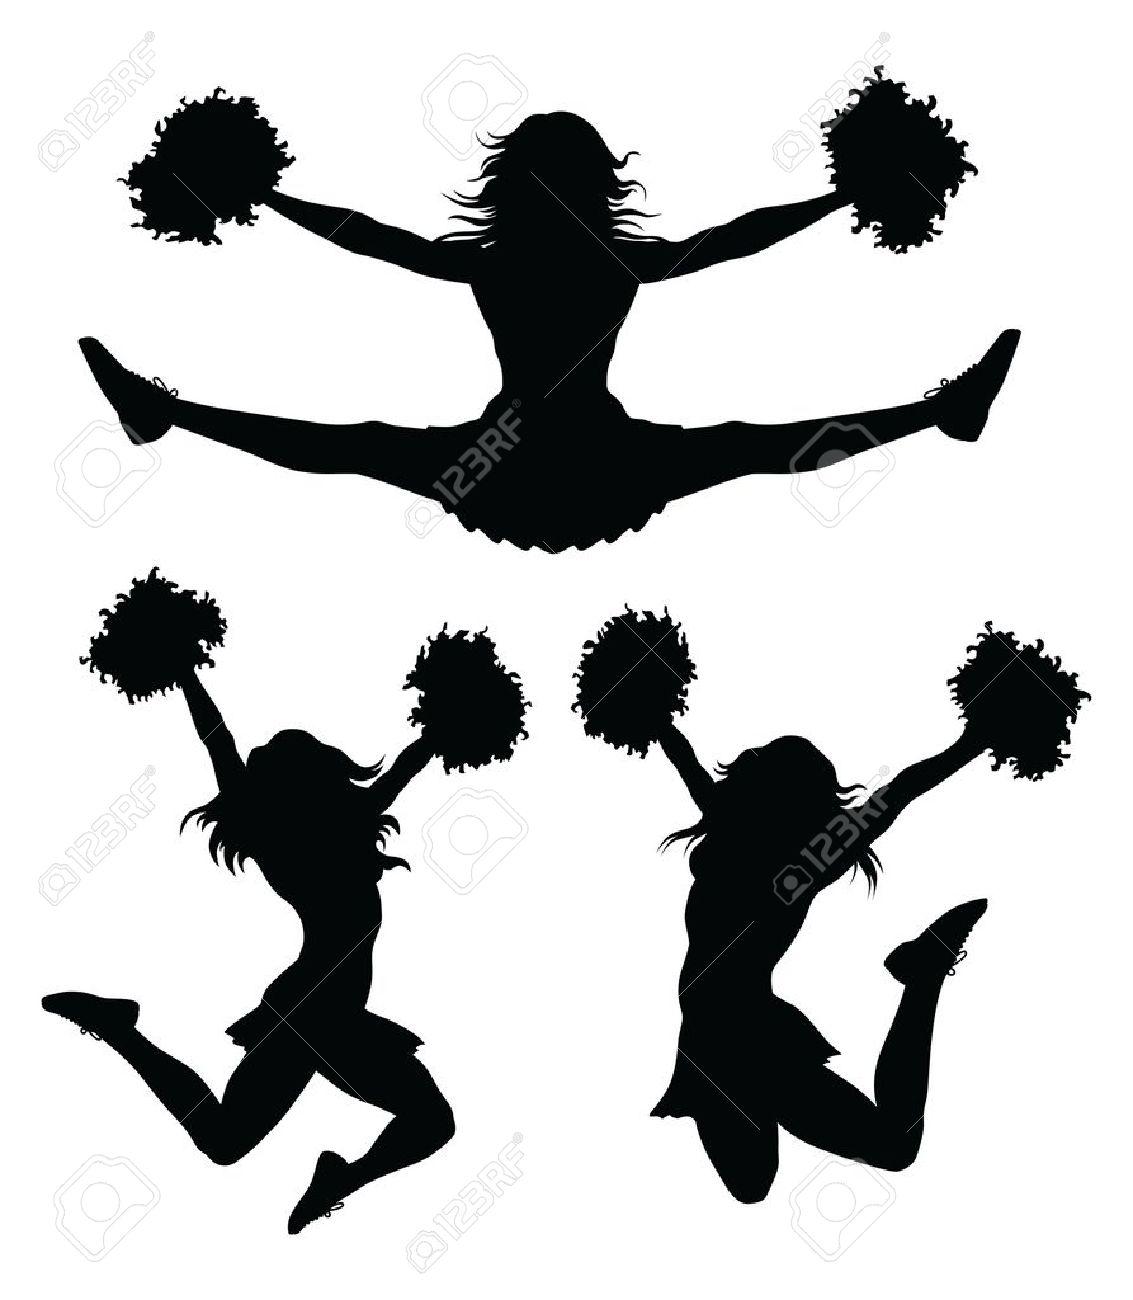 Cheerleader clipart silhouette.